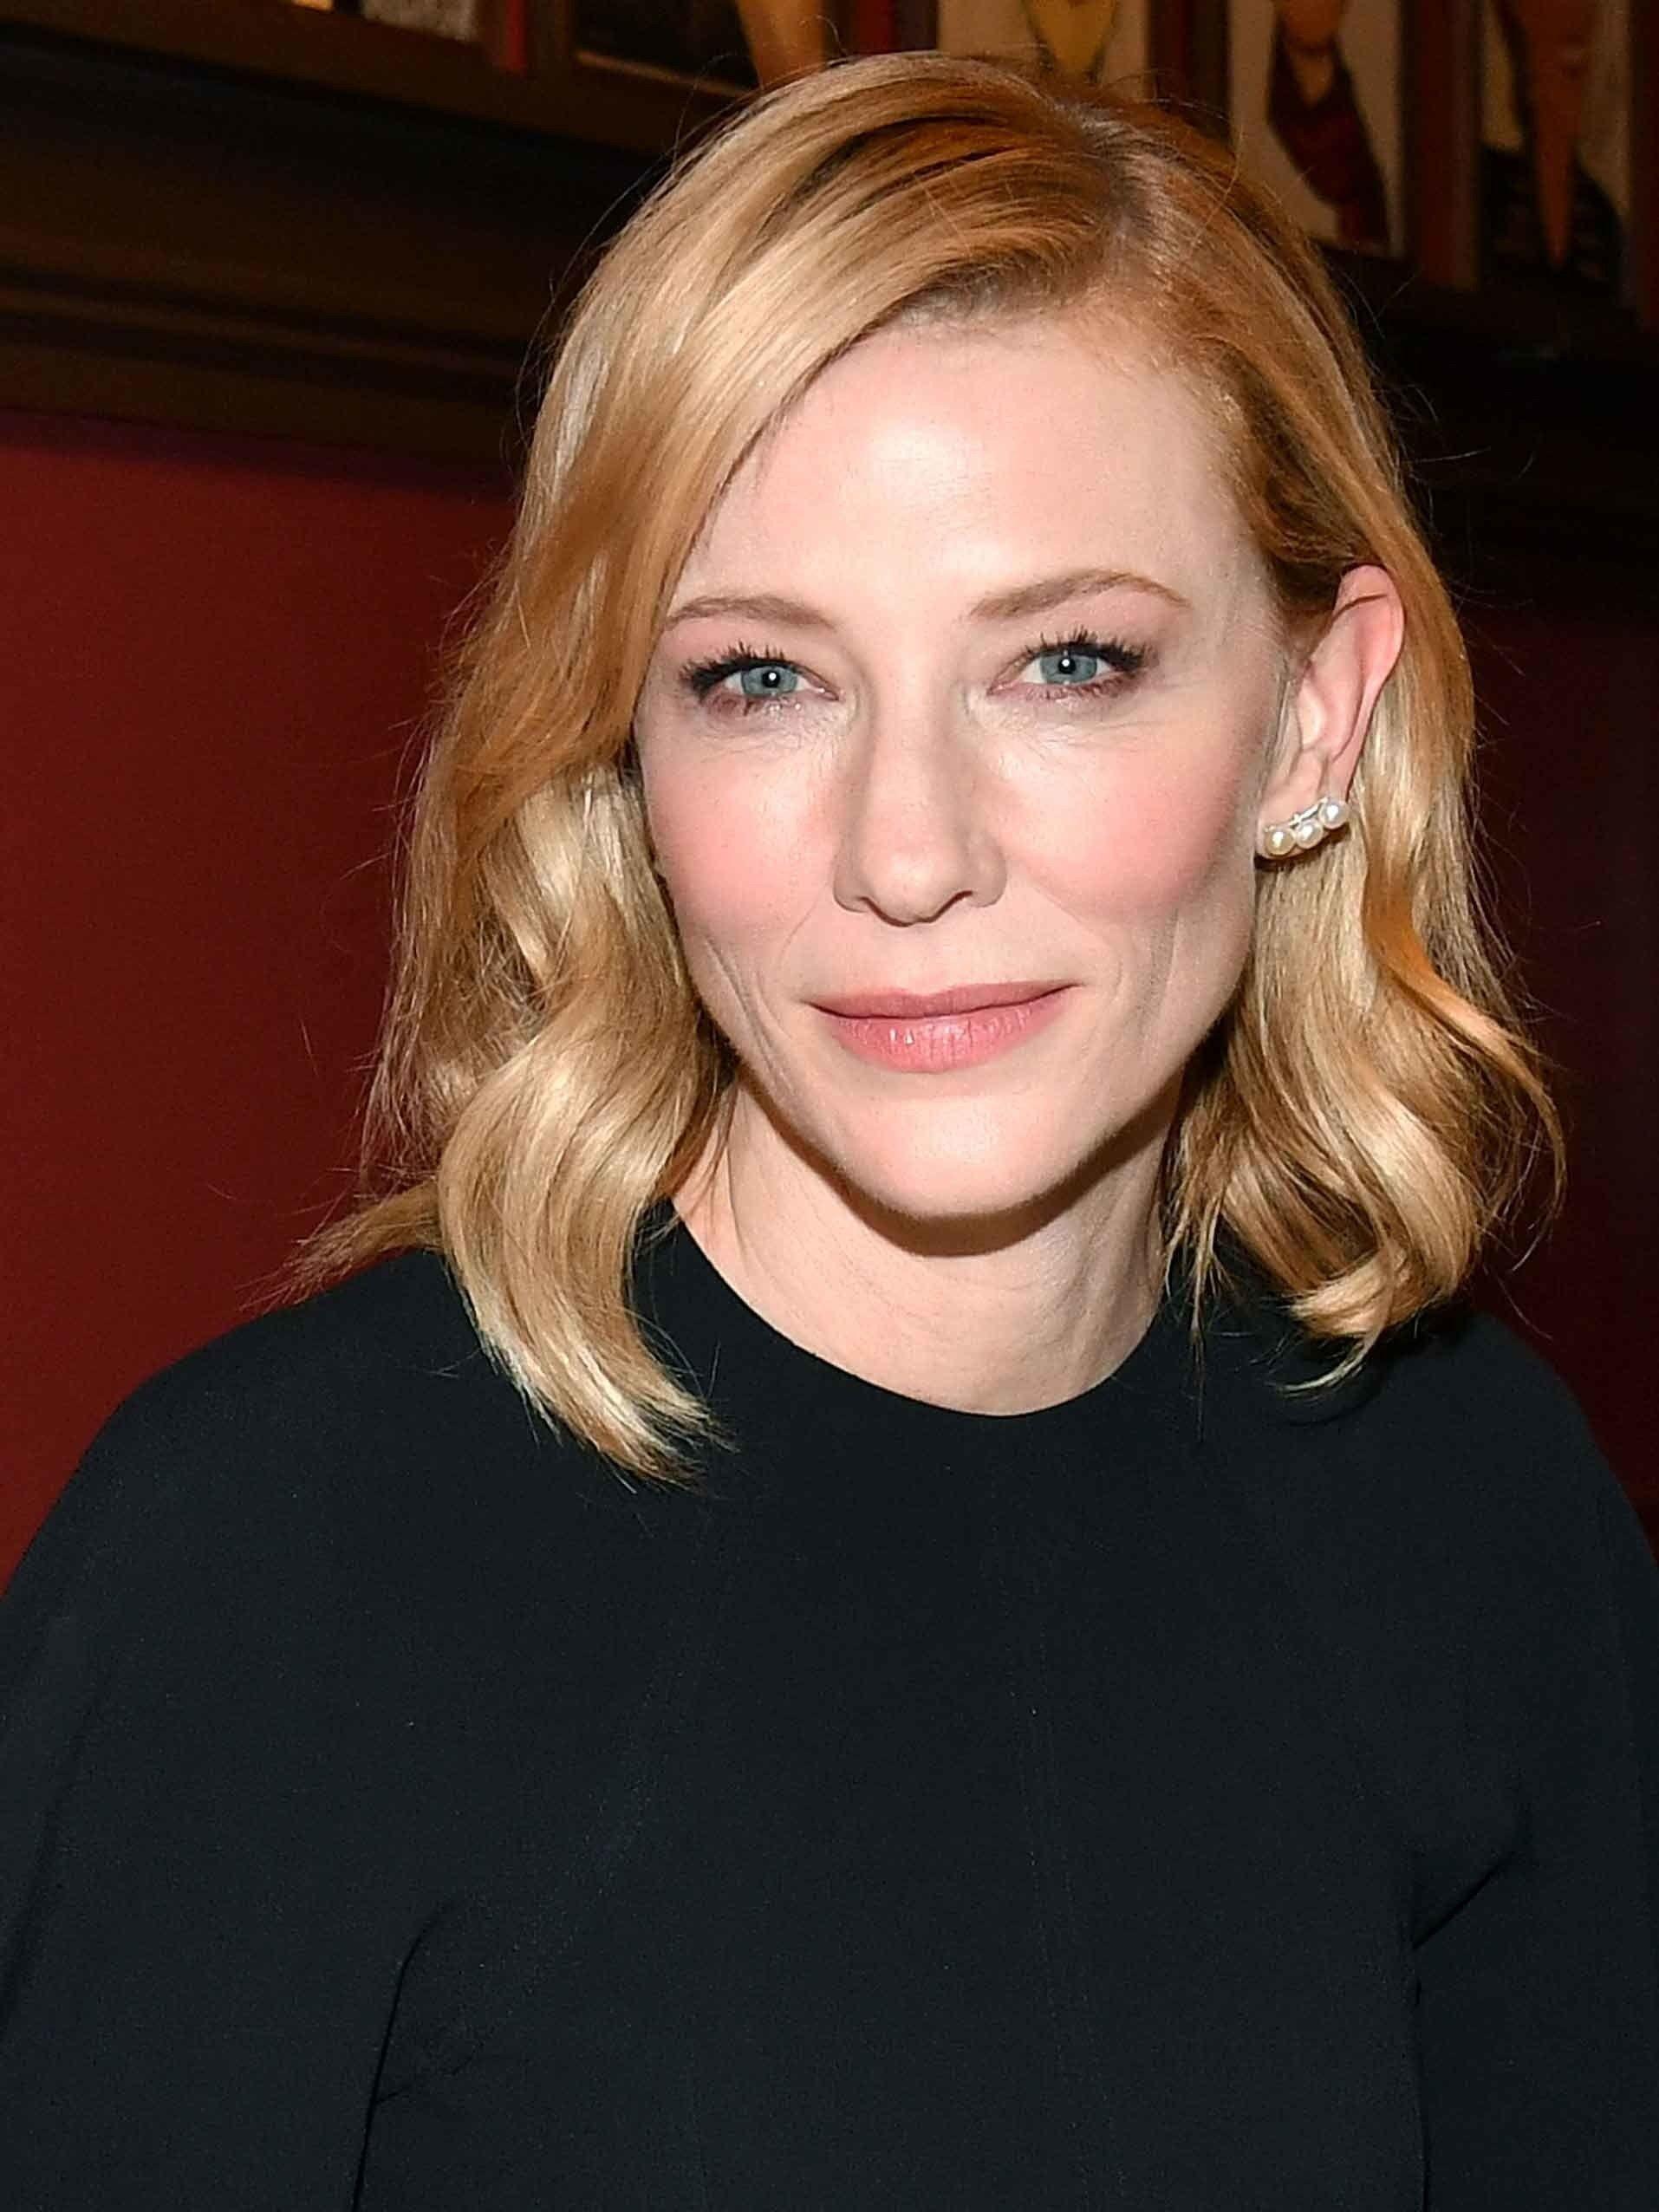 Cate Blanchett 49 Actress Crushes Cate Blanchett Skin Care Beauty Photos